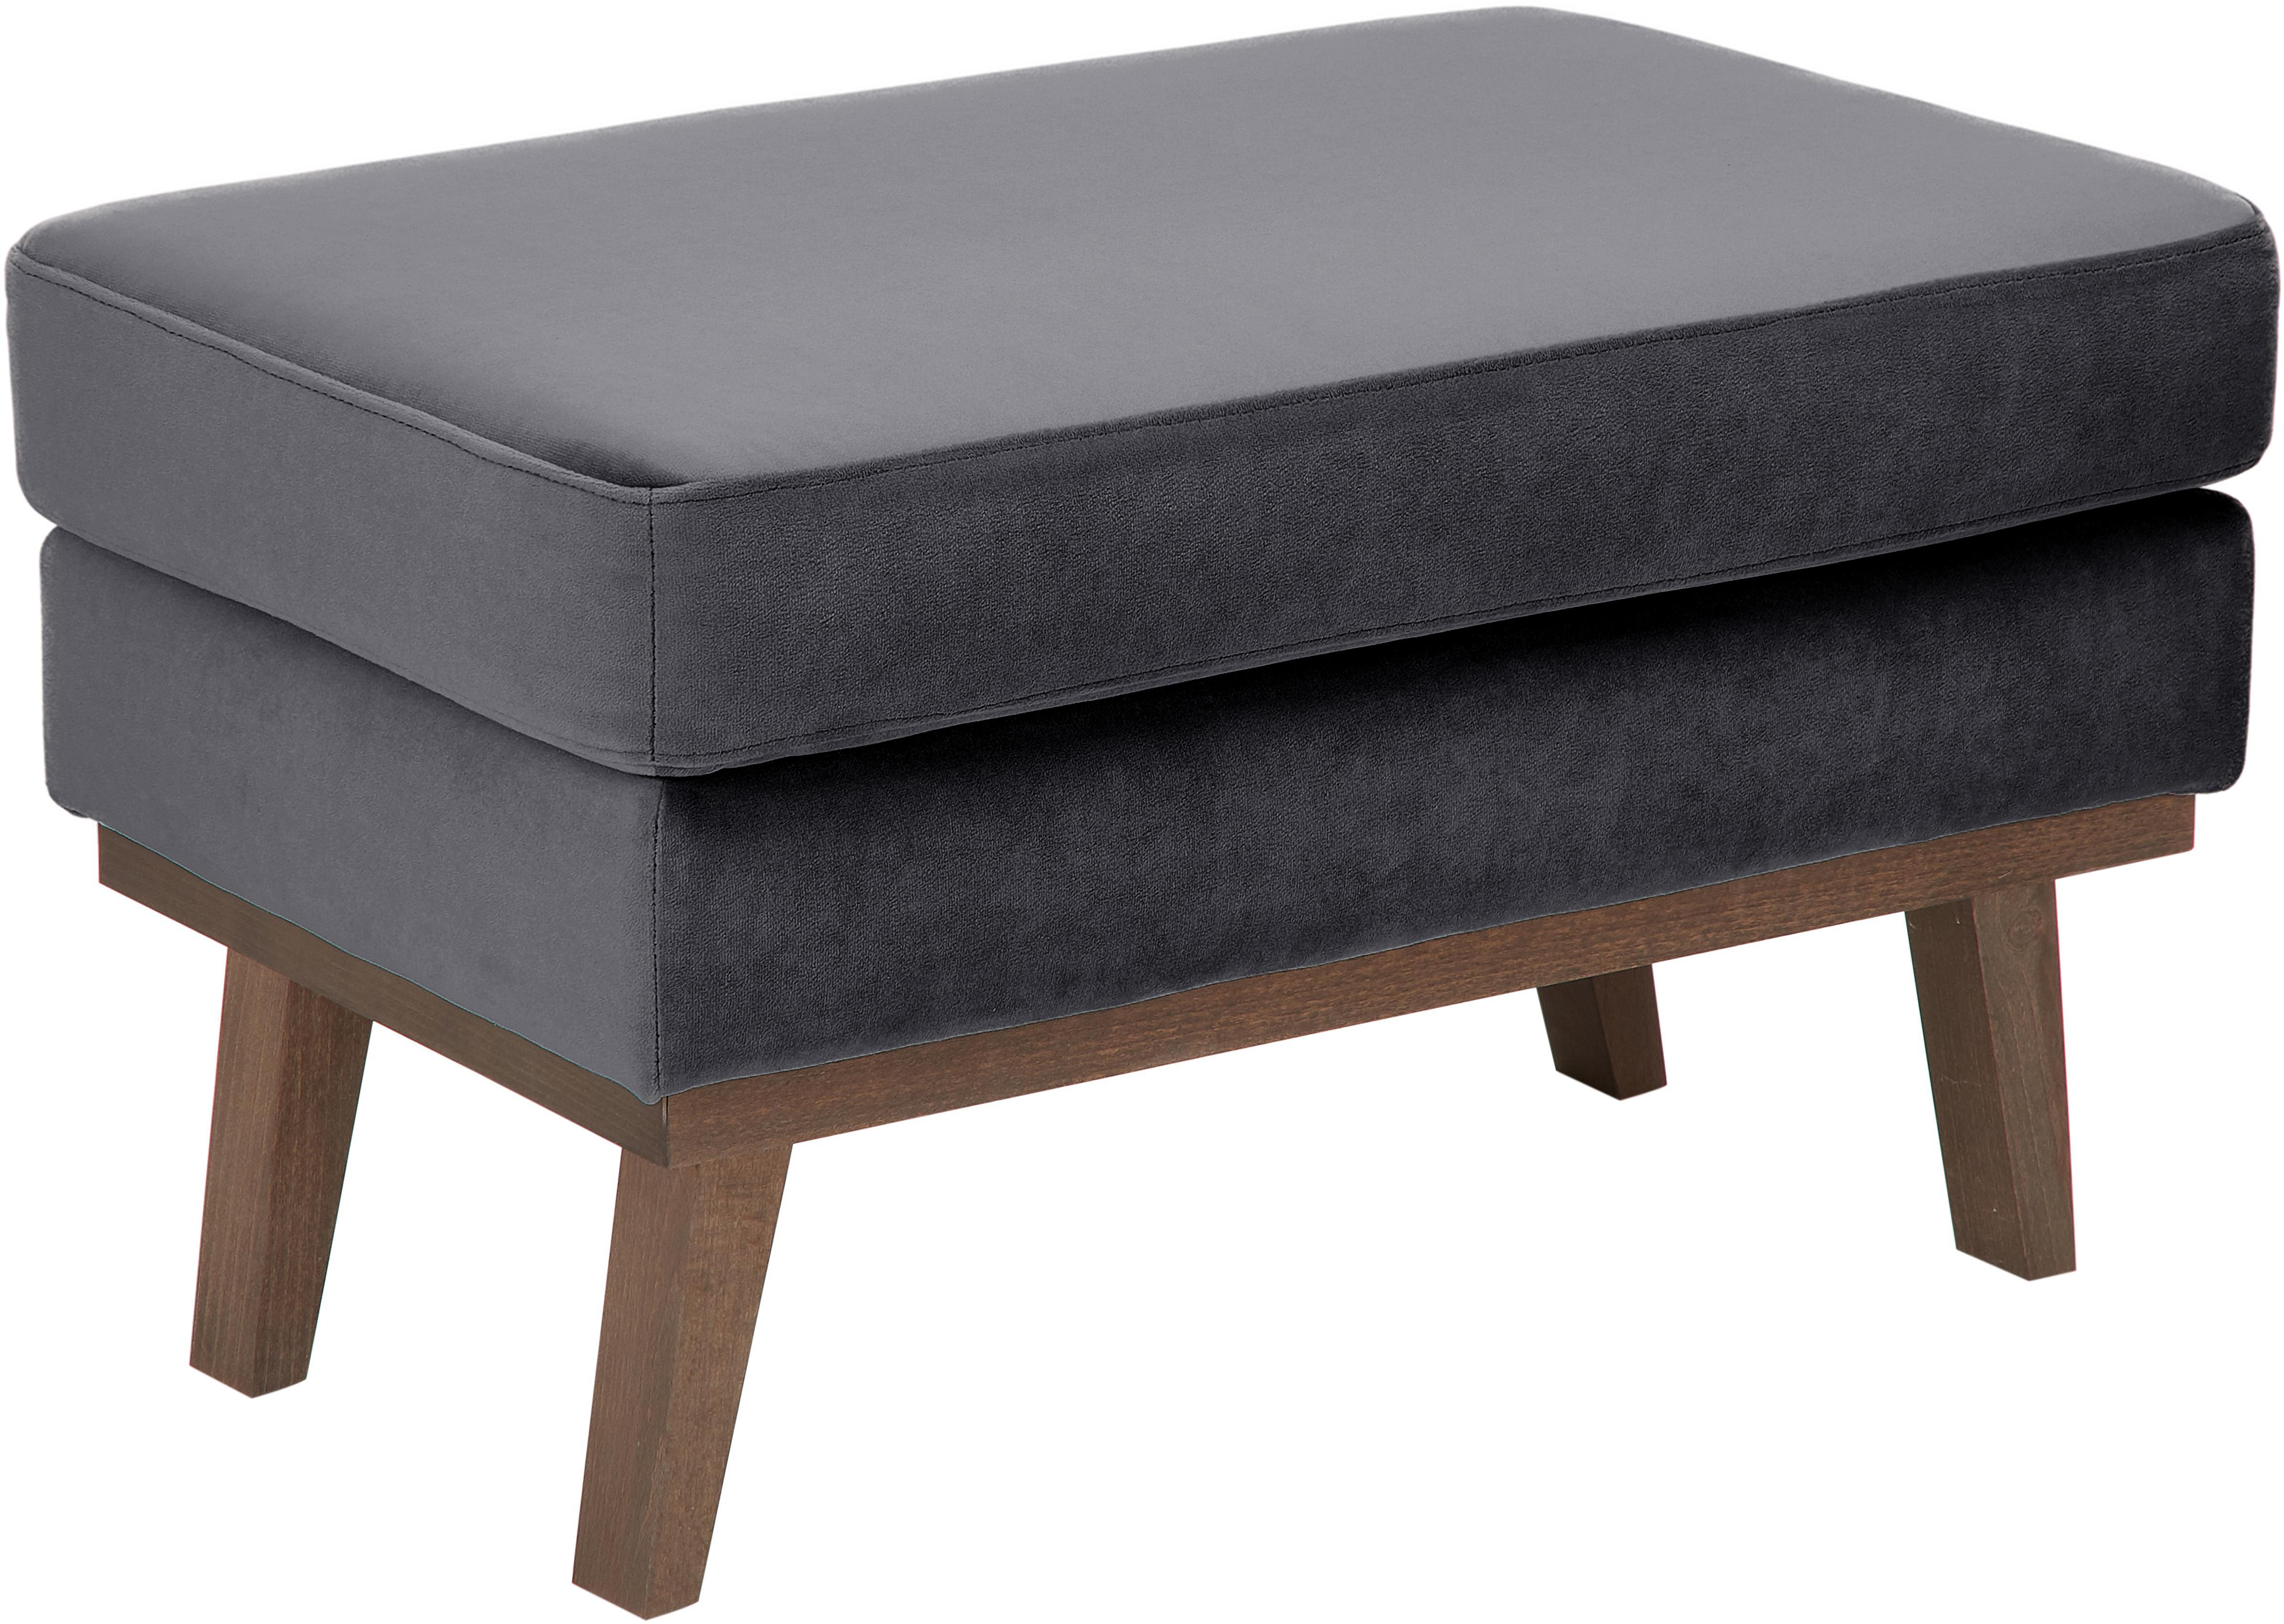 Sofa-Hocker Alva aus Samt, Bezug: Samt (Hochwertiger Polyes, Gestell: Massives Kiefernholz, Füße: Massives Buchenholz, gebe, Dunkelgrau, B 74 x T 44 cm